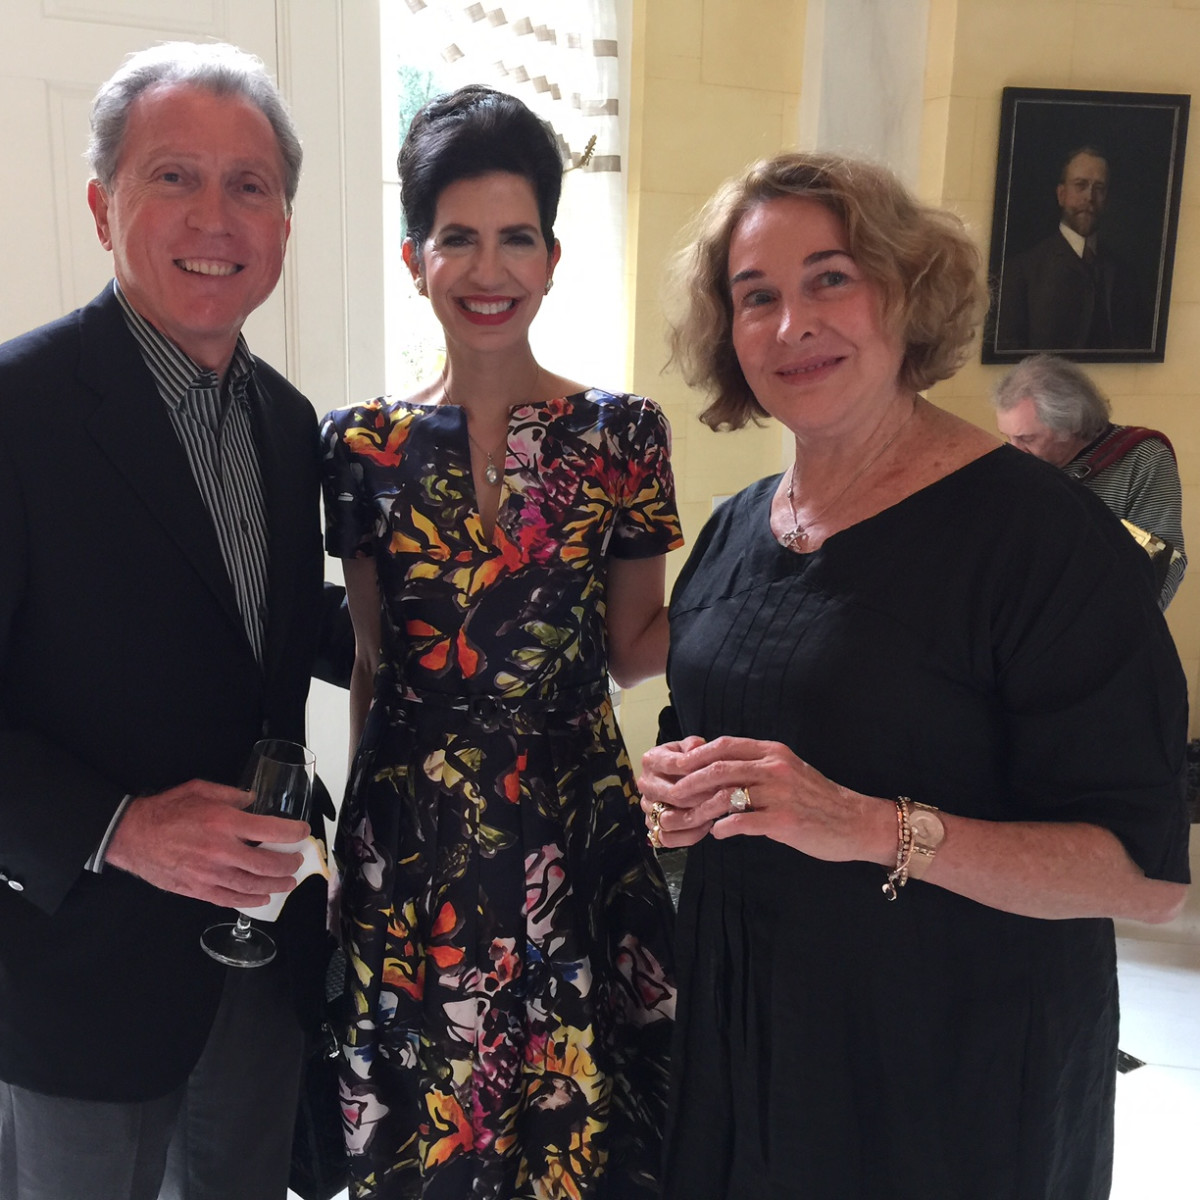 News, Shelby, Barbara Hines lunch on Venice, Oct. 2015, Martin Fein, Kelli Cohen Fein, Barbara Hines